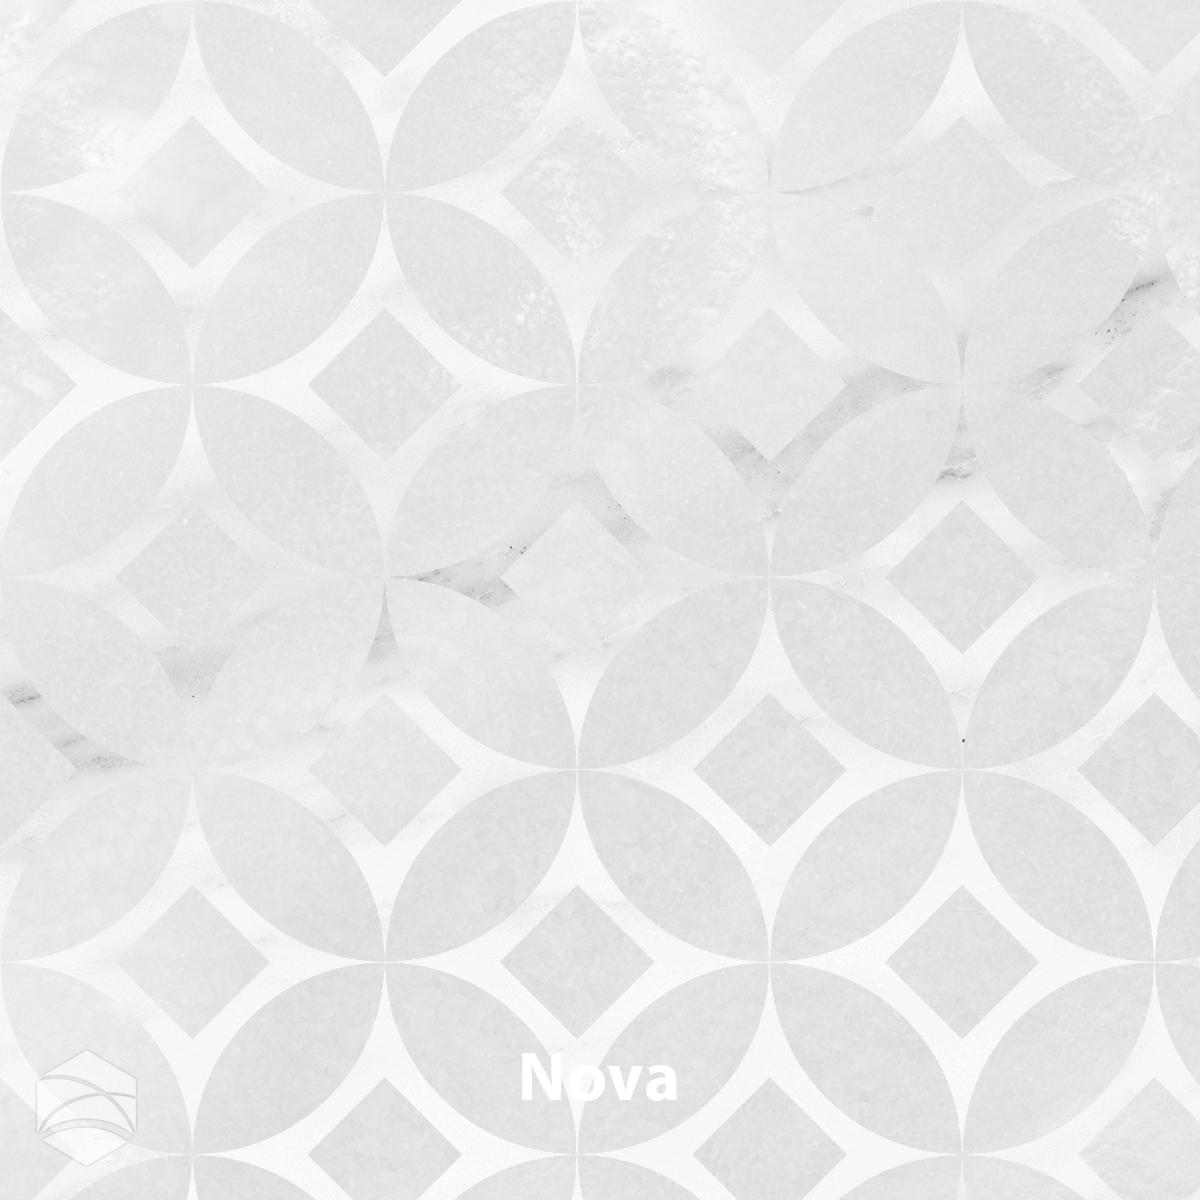 Nova_V2_12x12.jpg